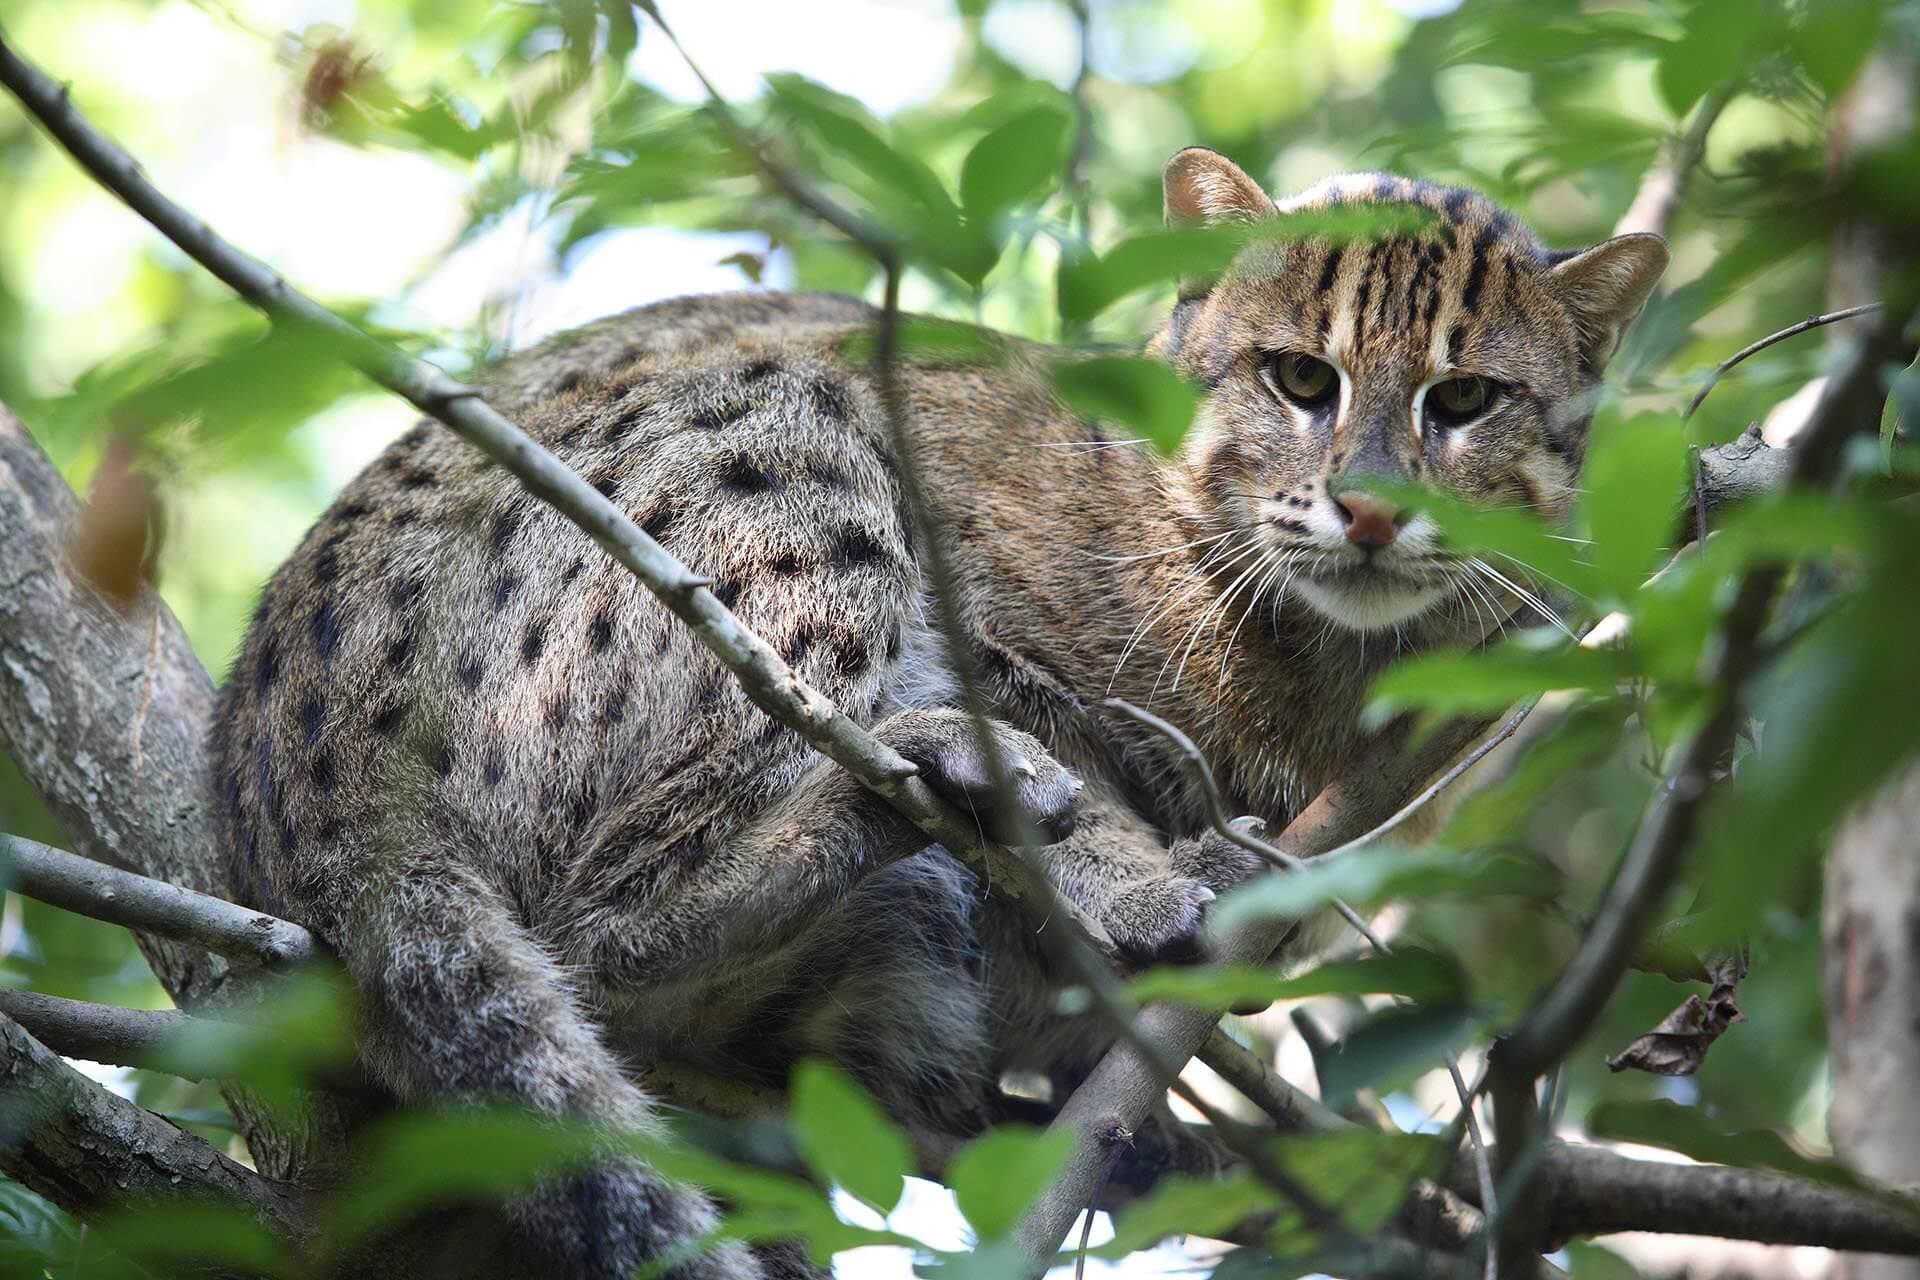 Fishing Cat in a tree